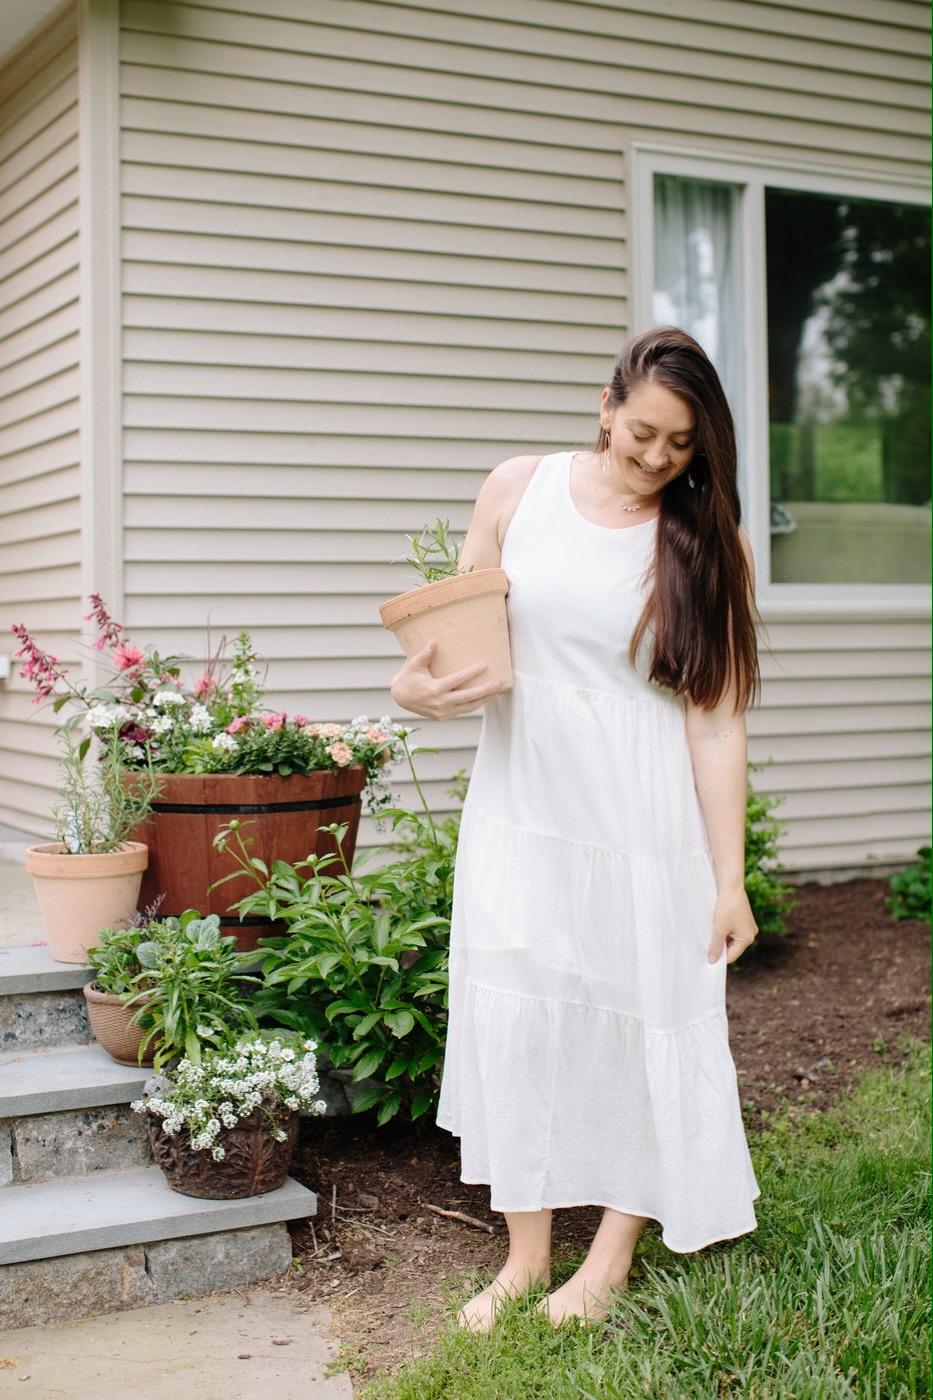 Christine Covino, lifestyle blogger wearing summer dress